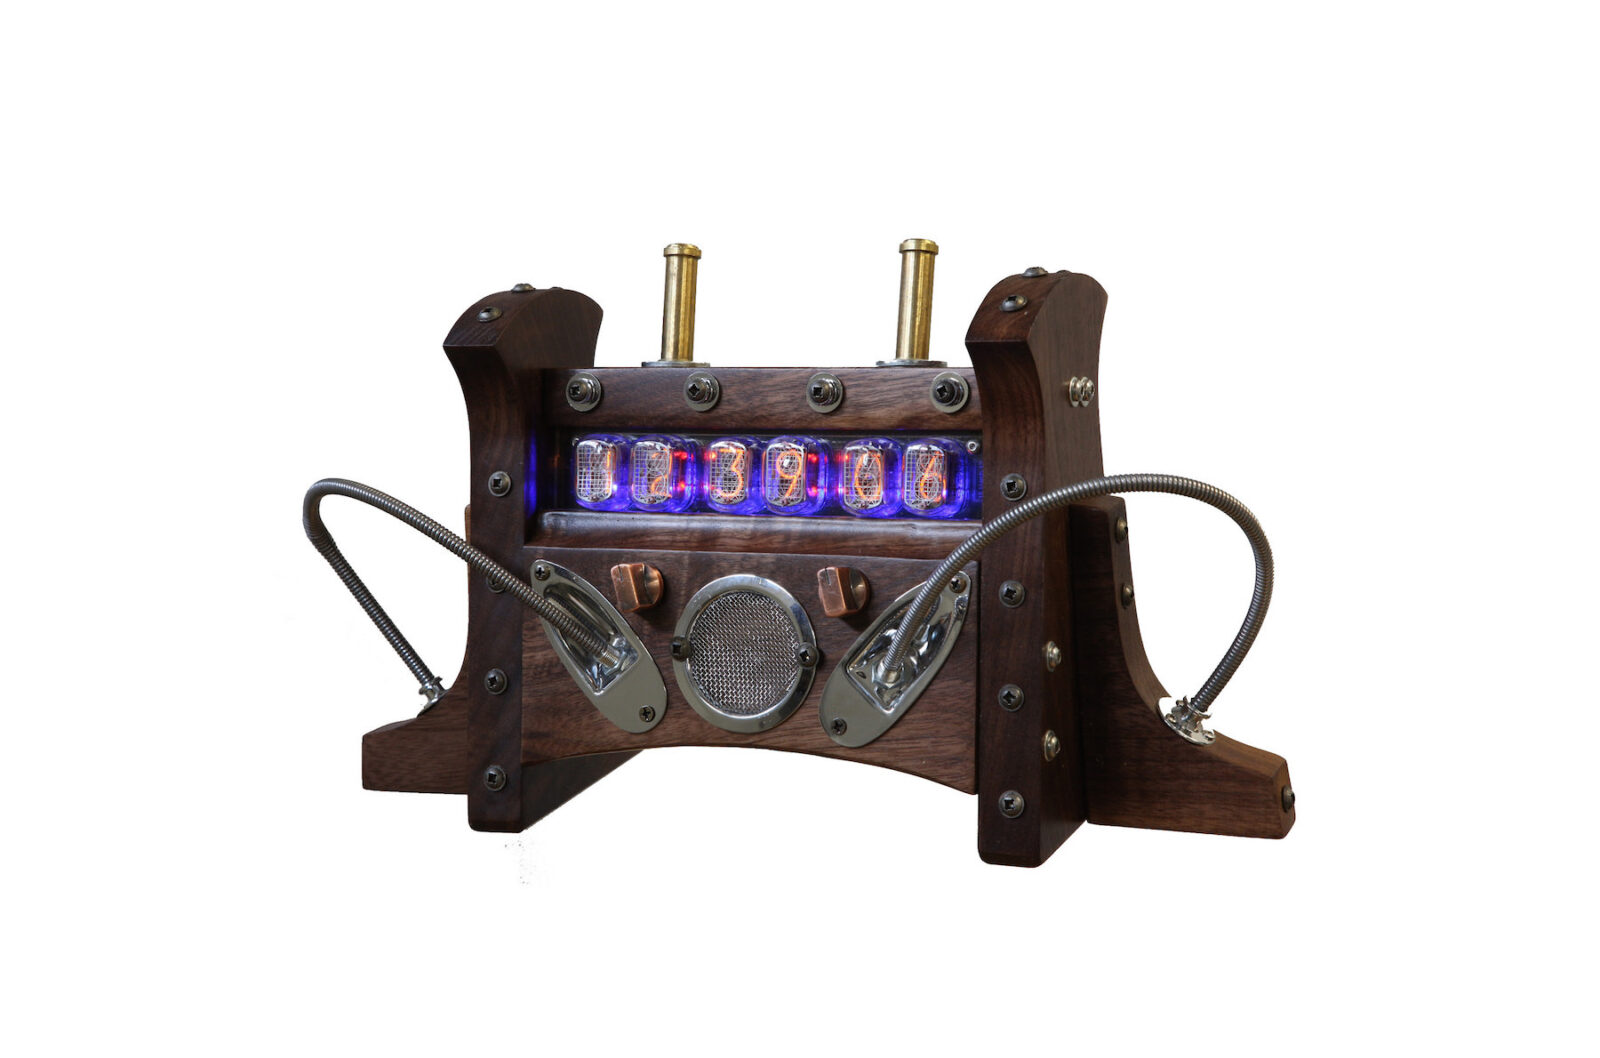 Steampunk Nixie Tube Clock 1600x1058 - Steampunk Nixie Tube Clock